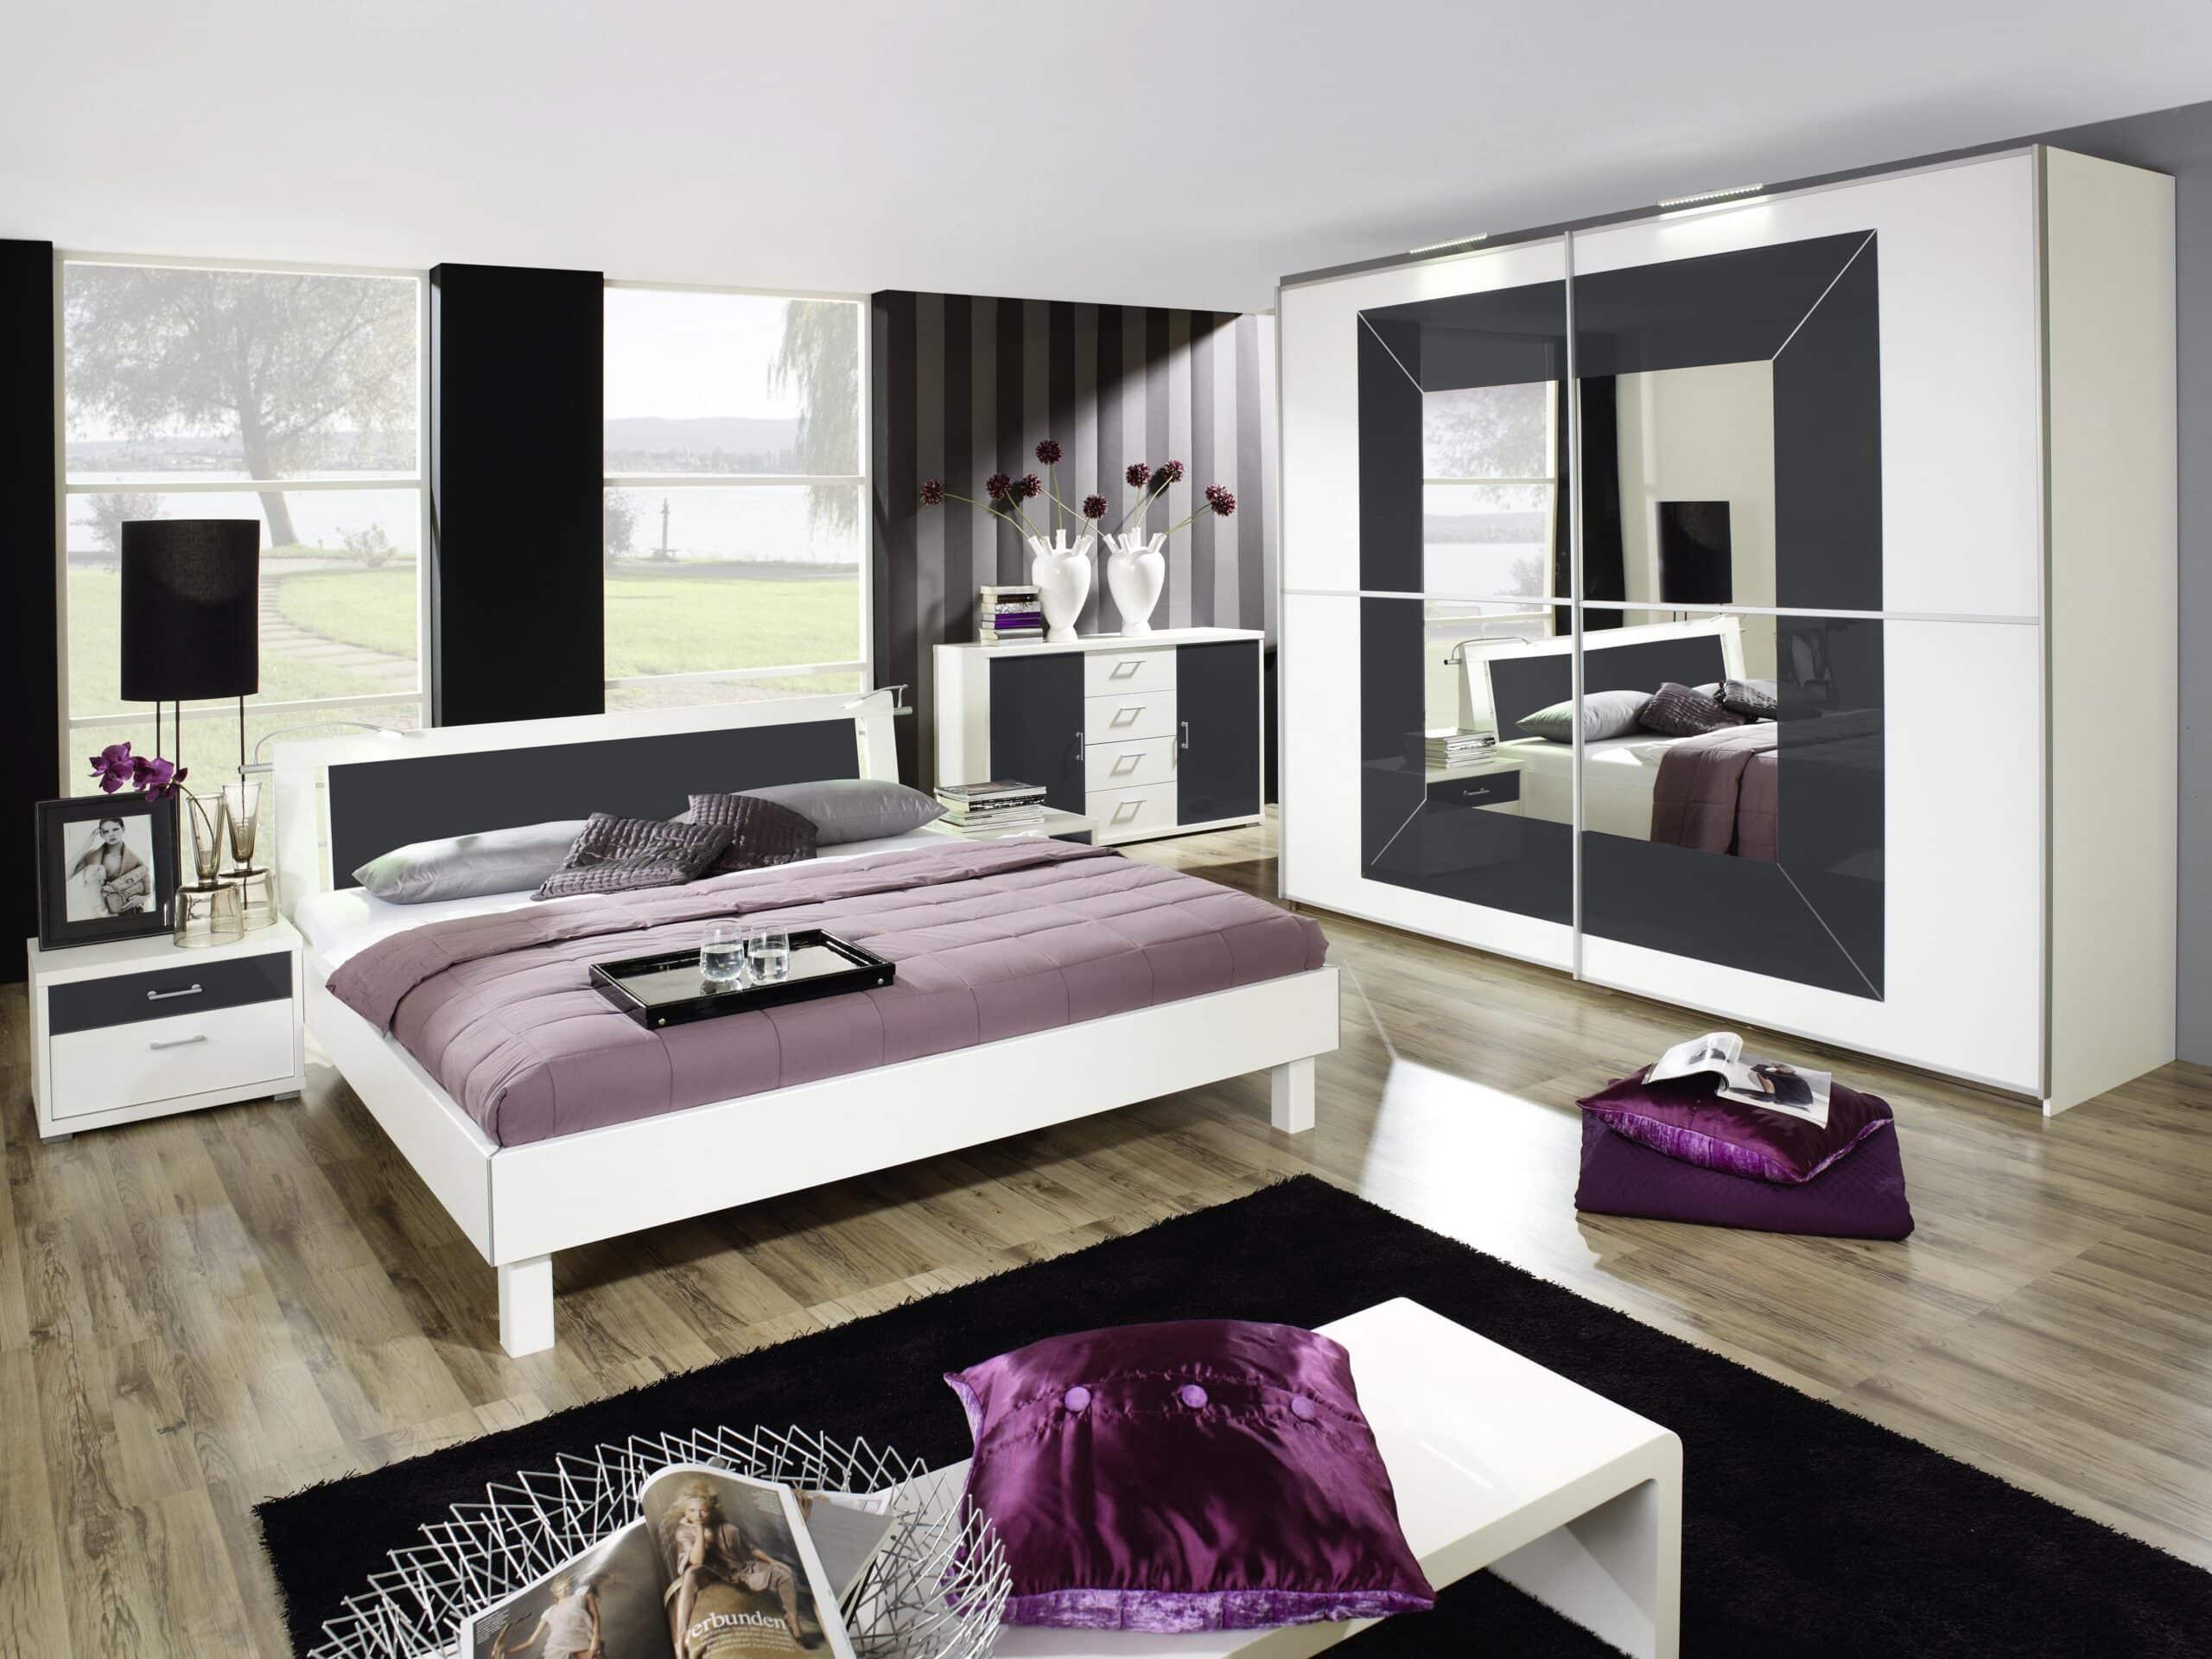 Deco chambre id e d co chambre adulte - Decoration interieur chambre adulte ...